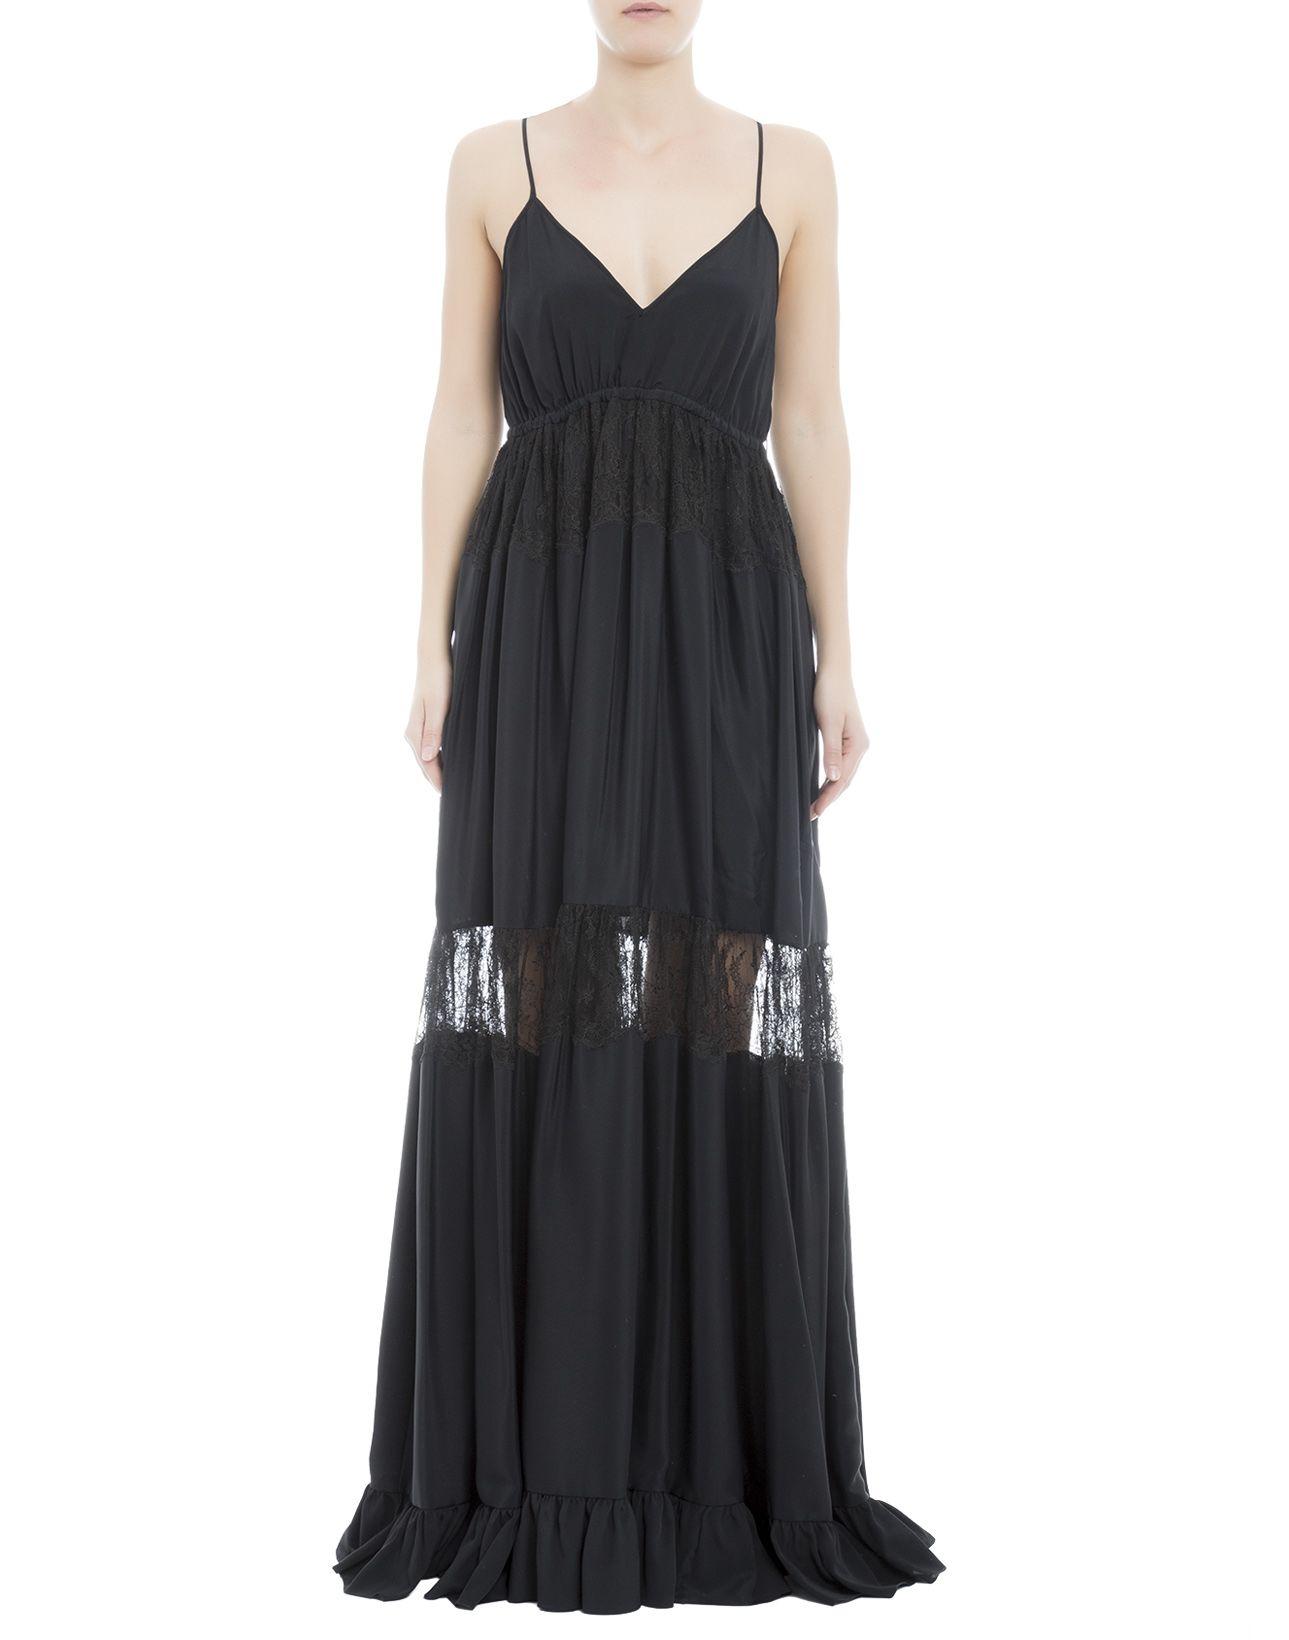 Black Acetate Dress